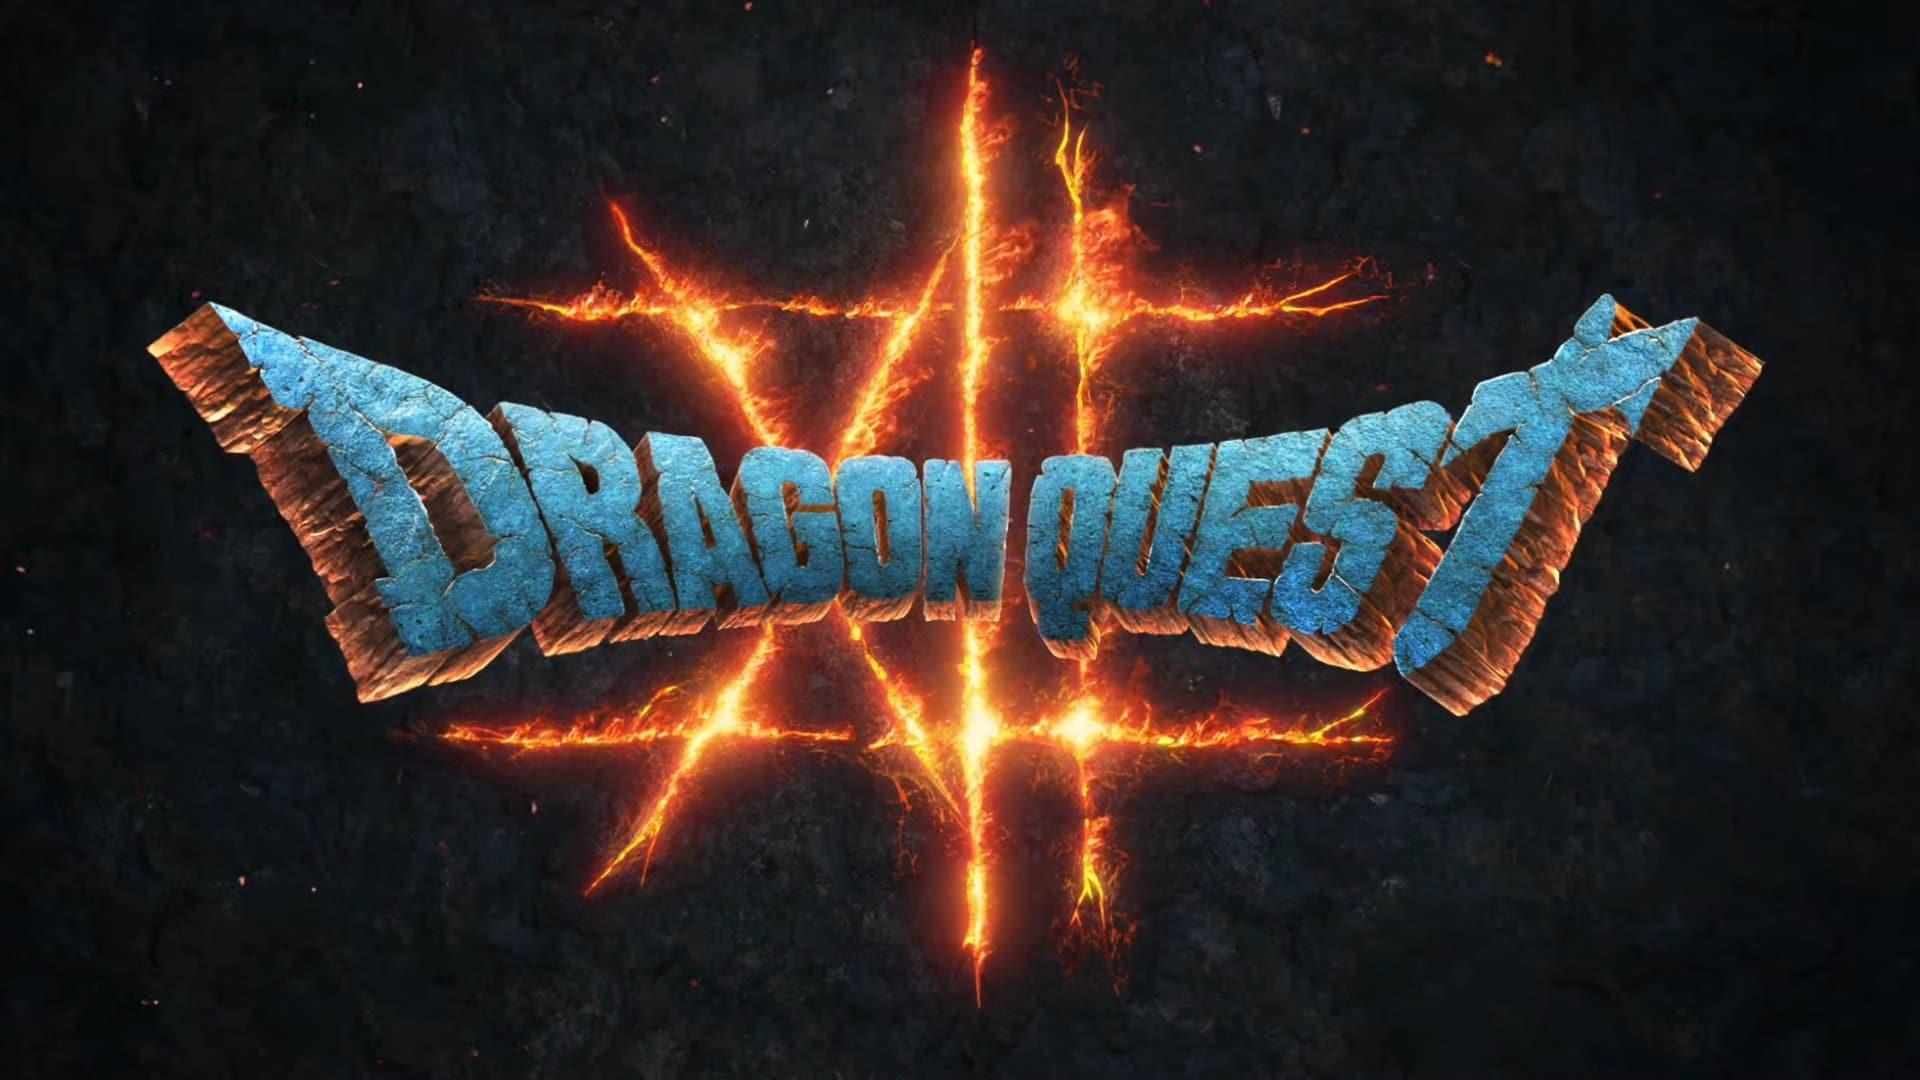 Dragon Quest 12: The Flames of Fate revelado con lanzamiento simultaneo